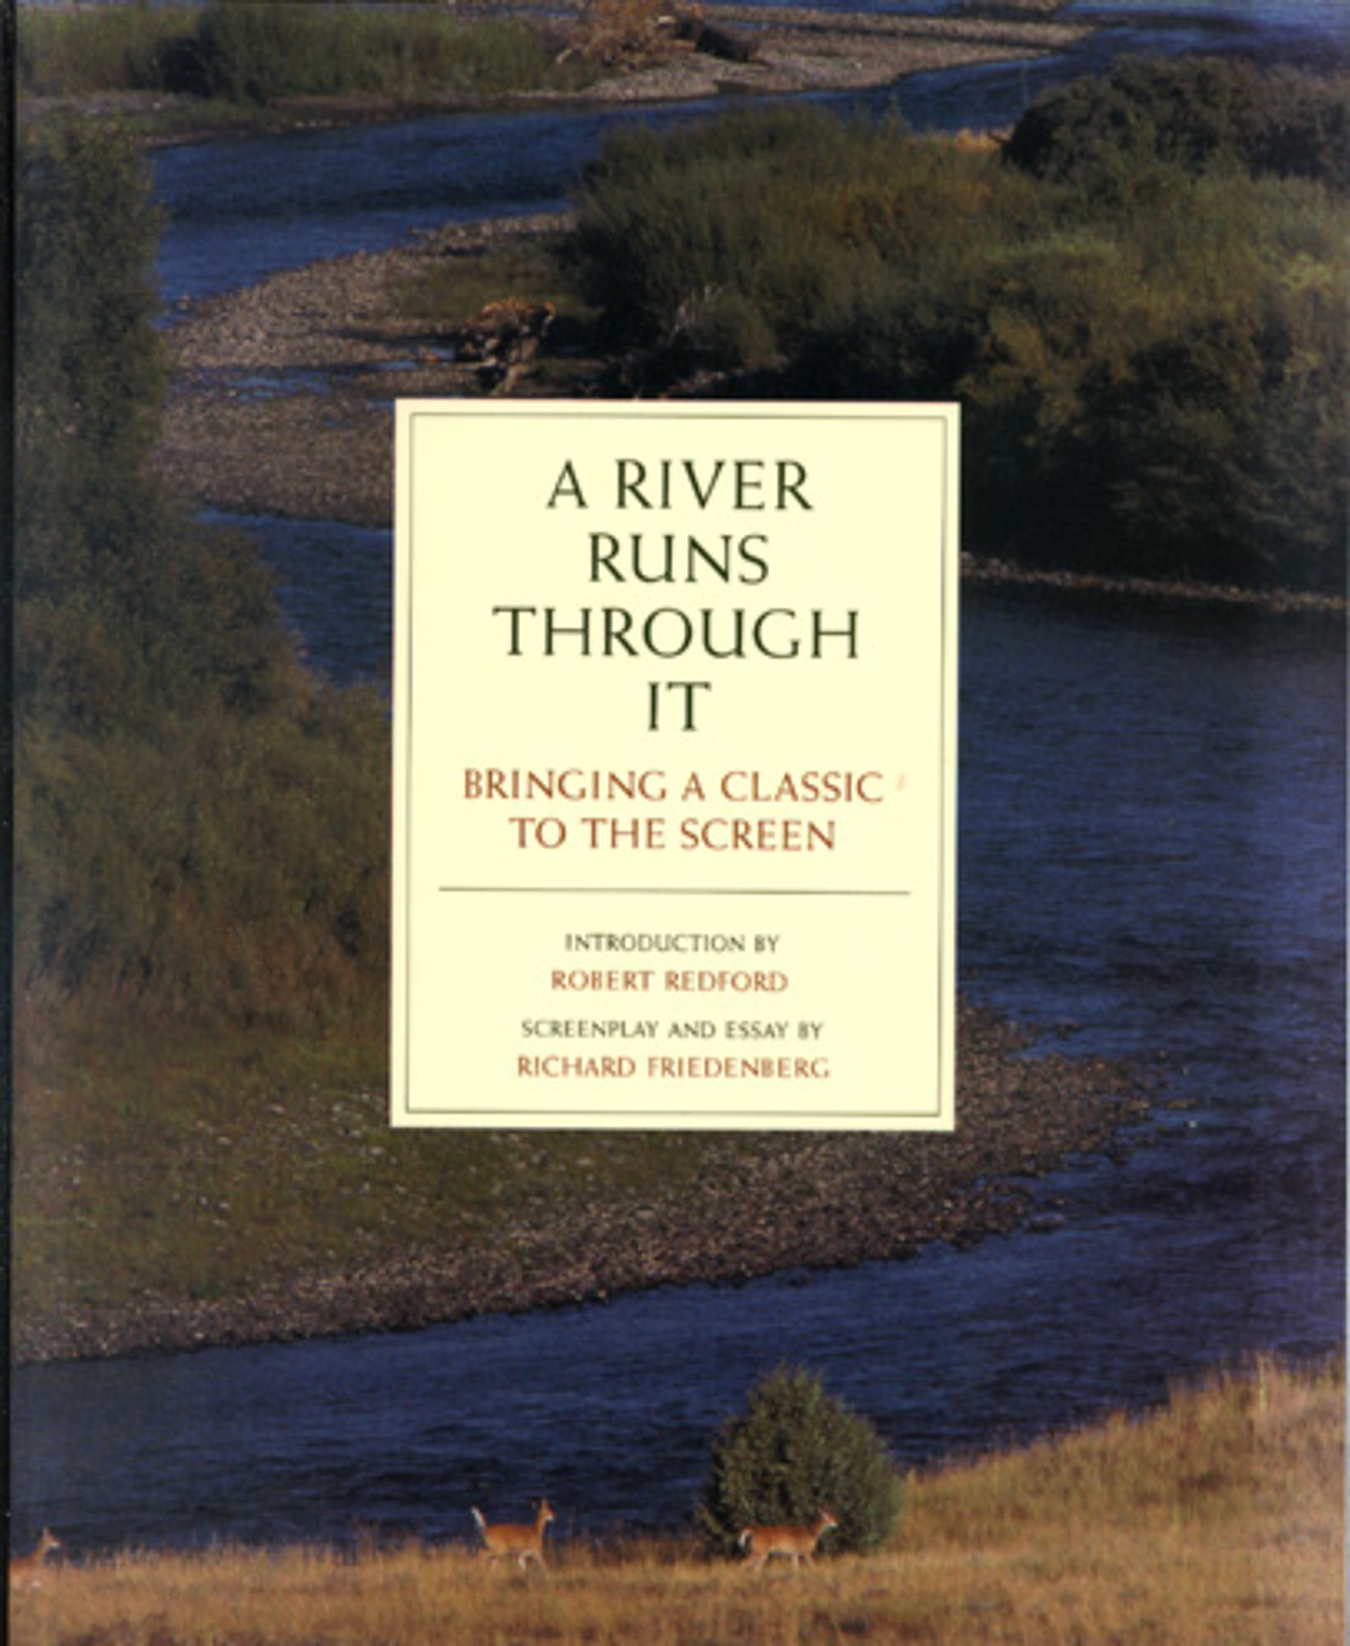 essay it river run through Essays and criticism on norman maclean's a river runs through it - critical context.